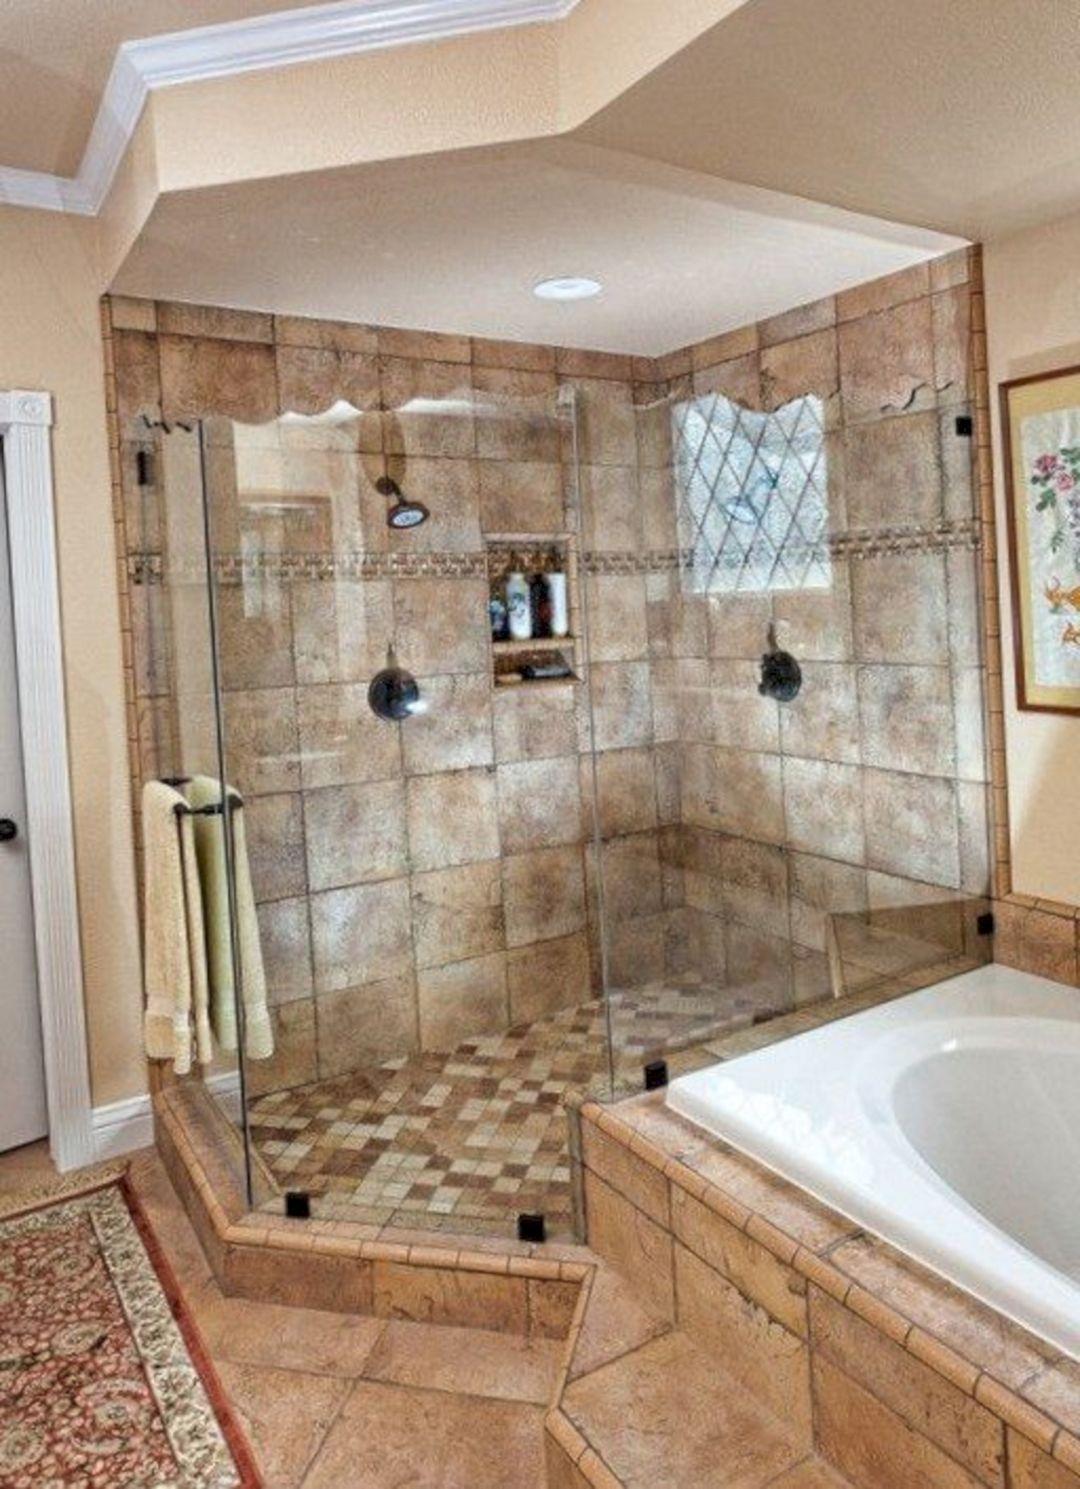 most popular small bathroom remodel ideas on a budget in on bathroom renovation ideas on a budget id=49489